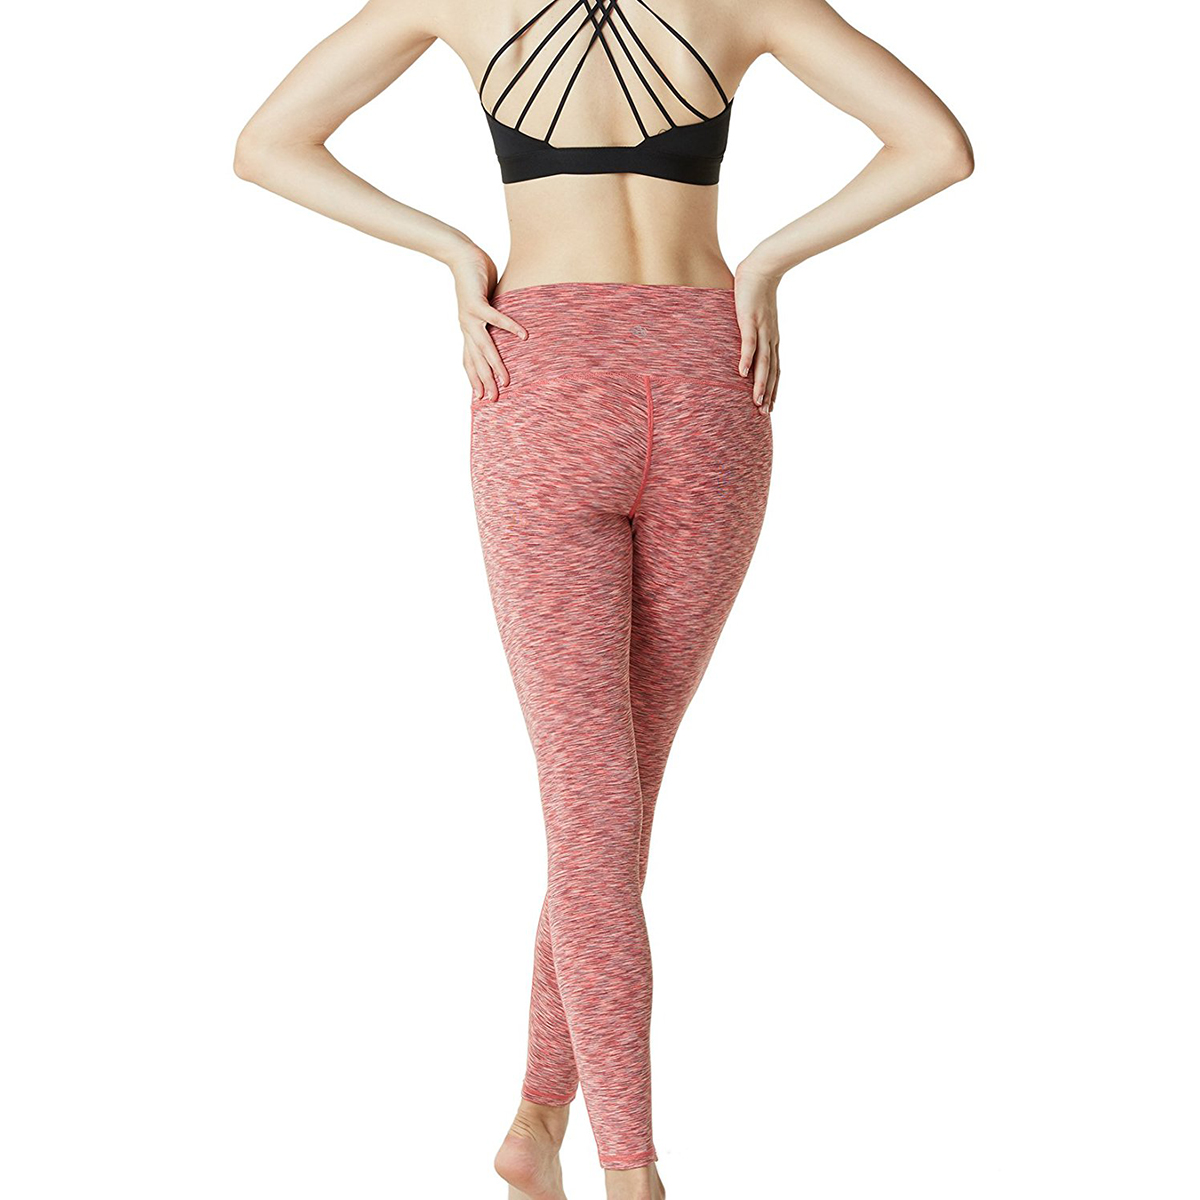 thumbnail 91 - TSLA Tesla FYP42 Women's High-Waisted Ultra-Stretch Tummy Control Yoga Pants